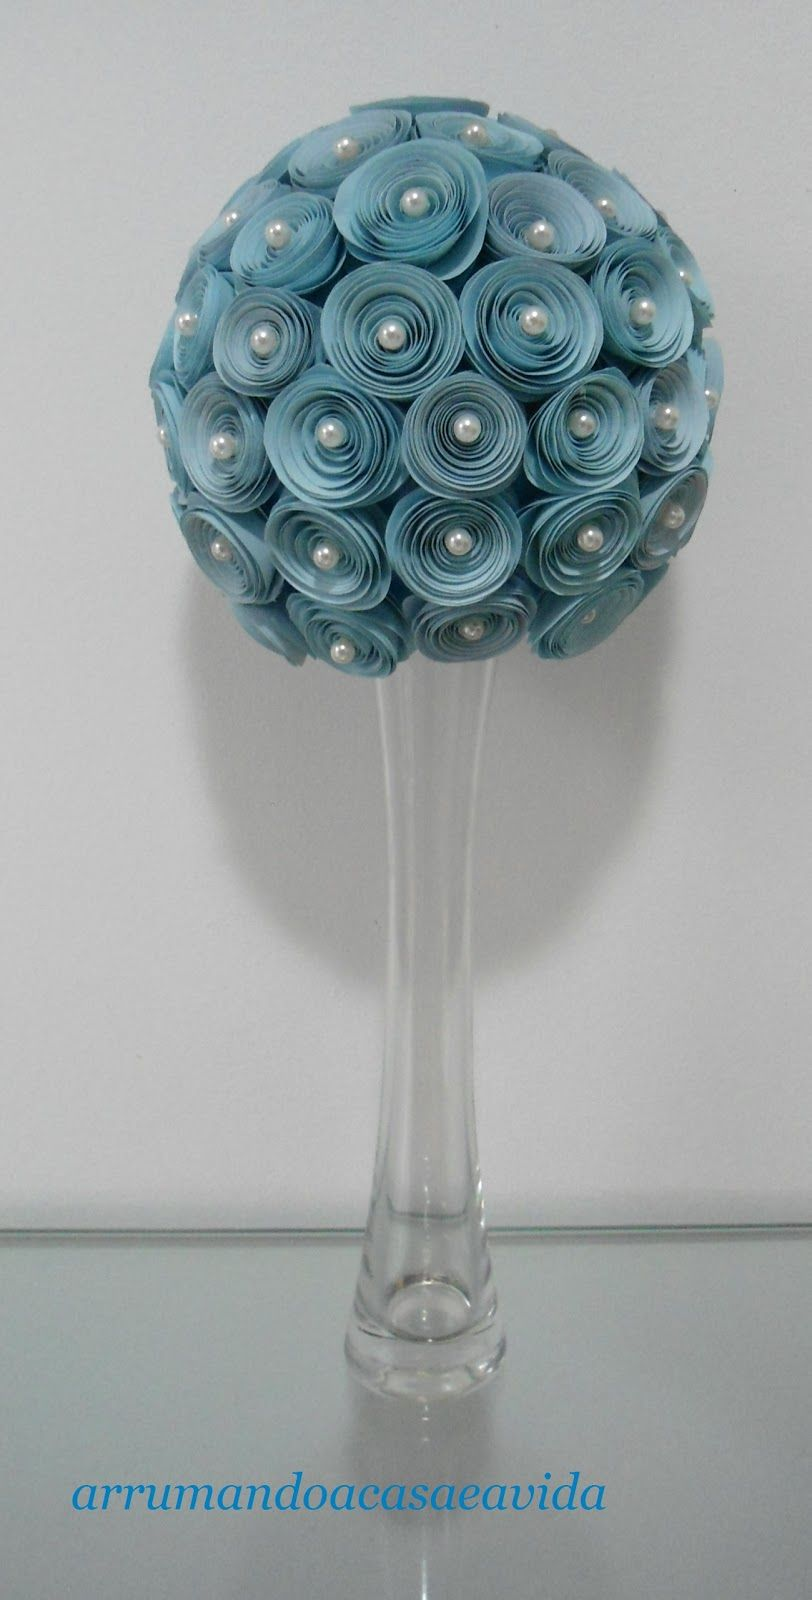 Dsc03458g 8121600 Paper Flowers Pinterest Flowers